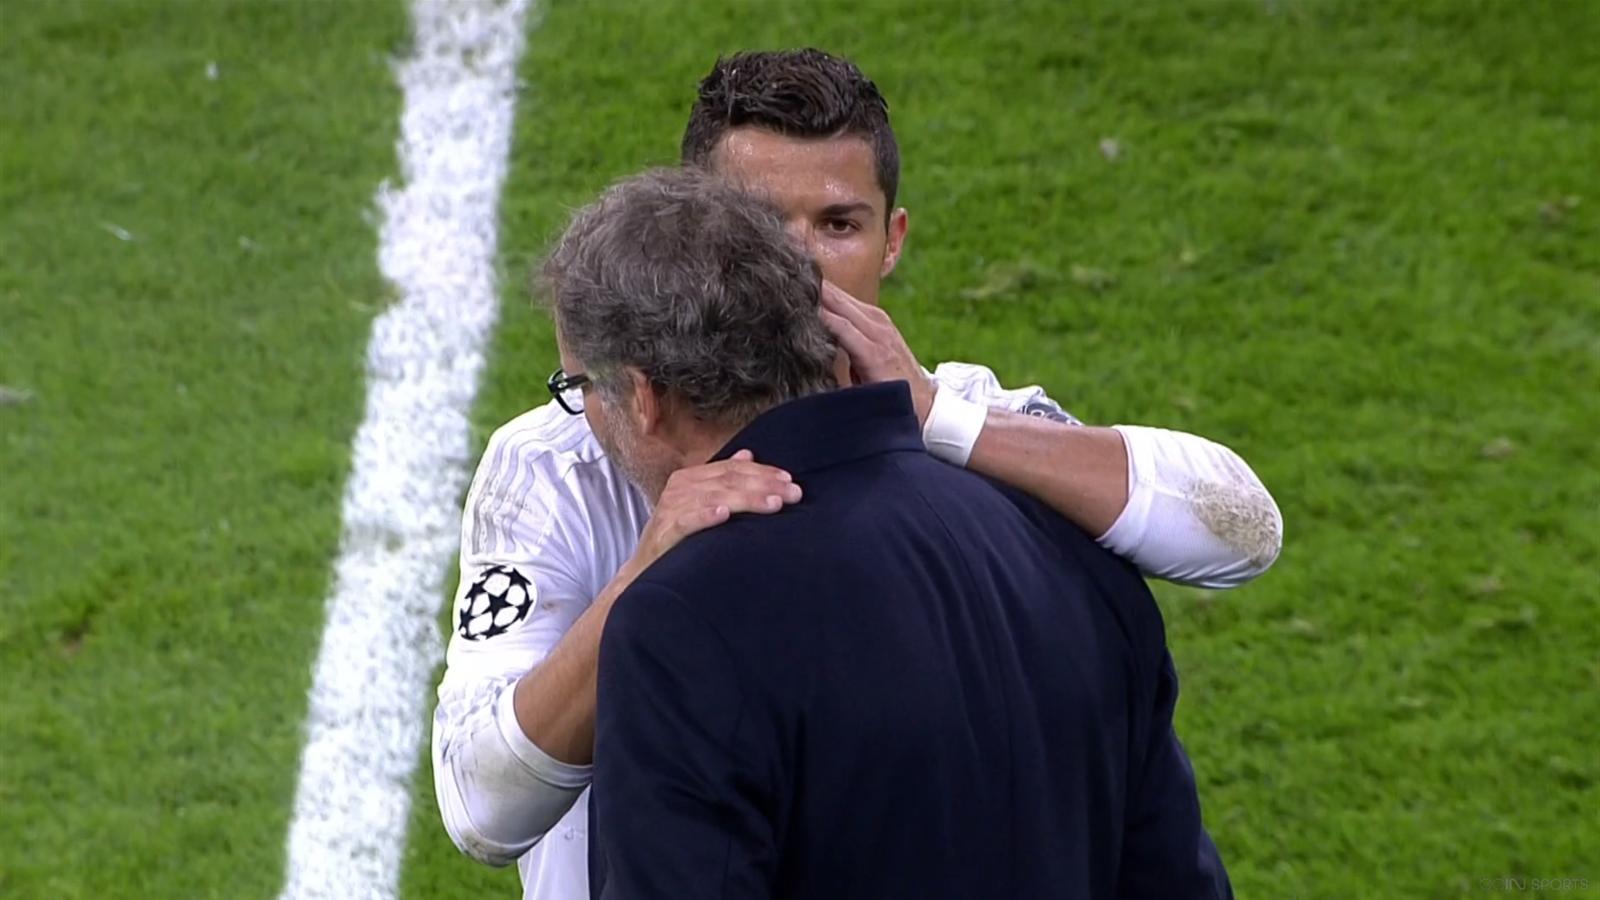 Cristiano Ronaldo told something to Laurent Blanc.